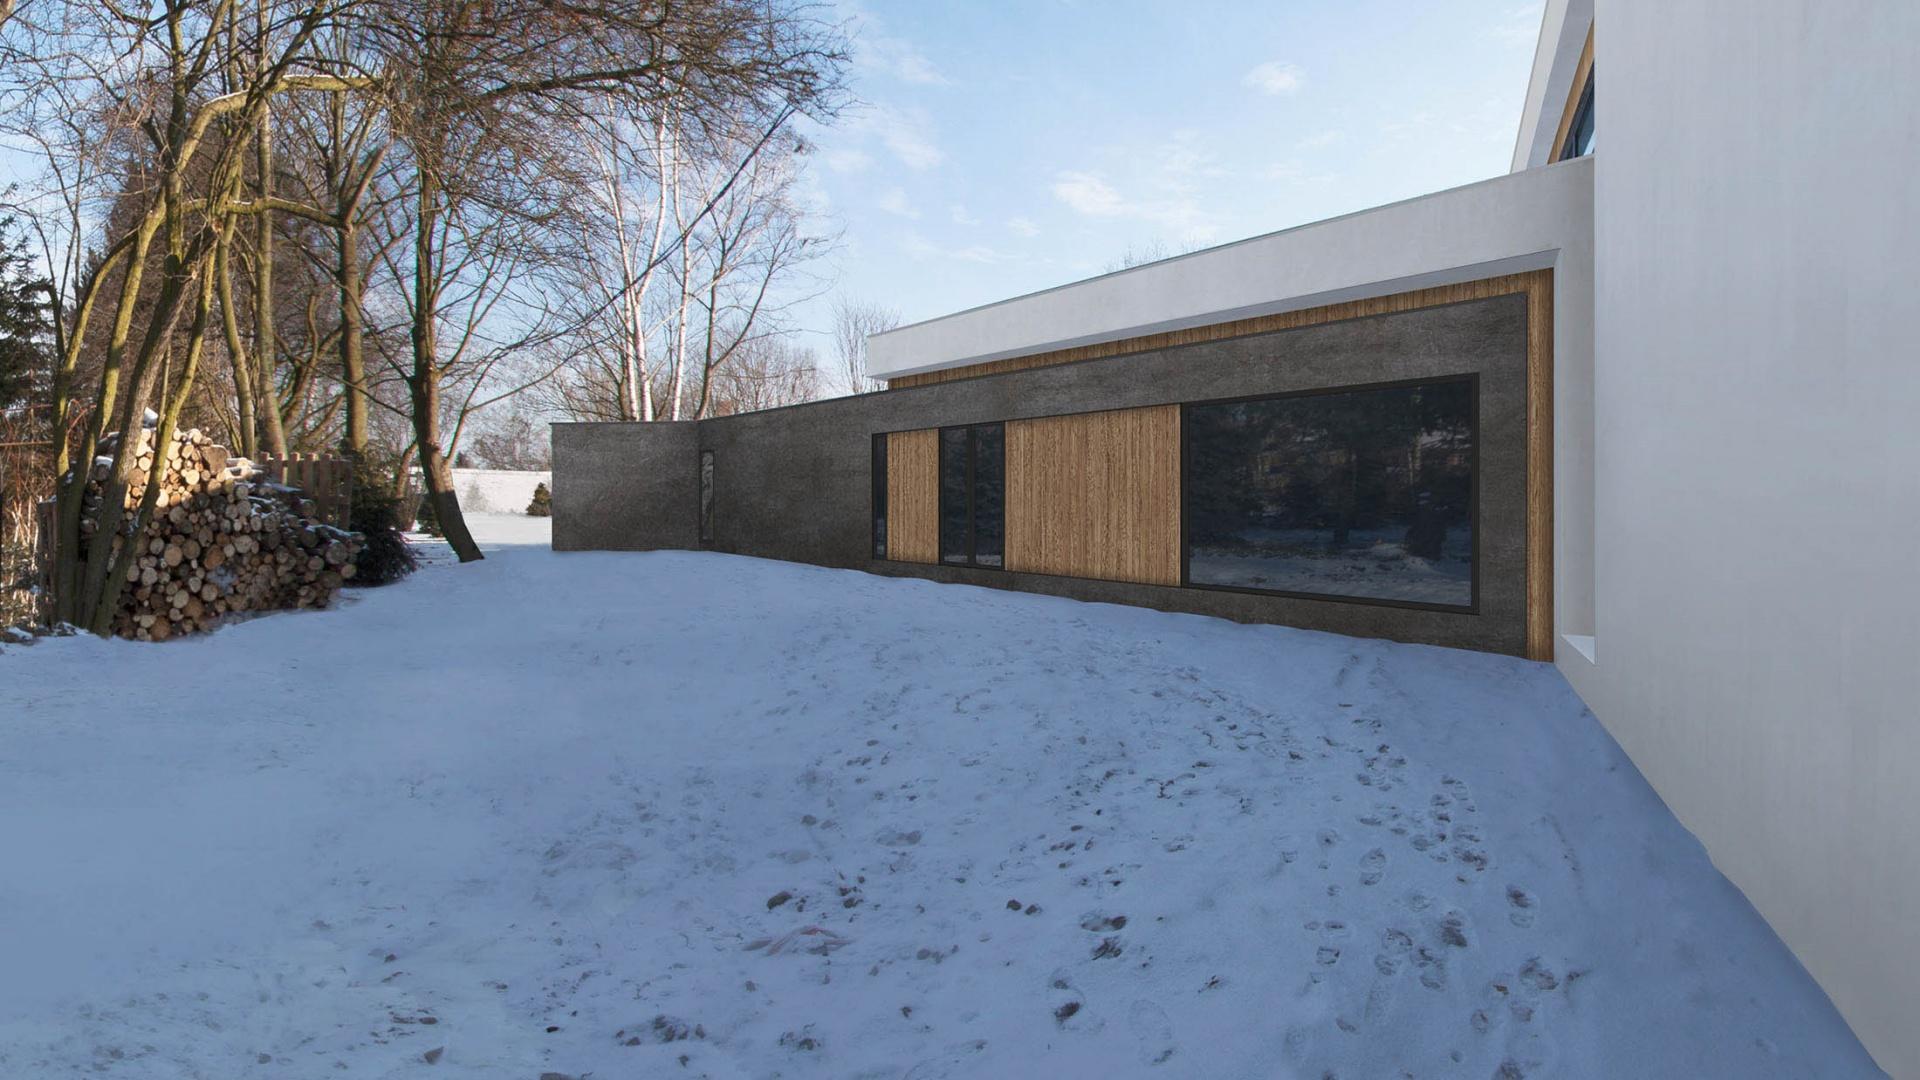 Dom RE: GROUND FLOOR HOUSE 1.0 projektu architekta Marcina Tomaszewskiego REFORM Architekt